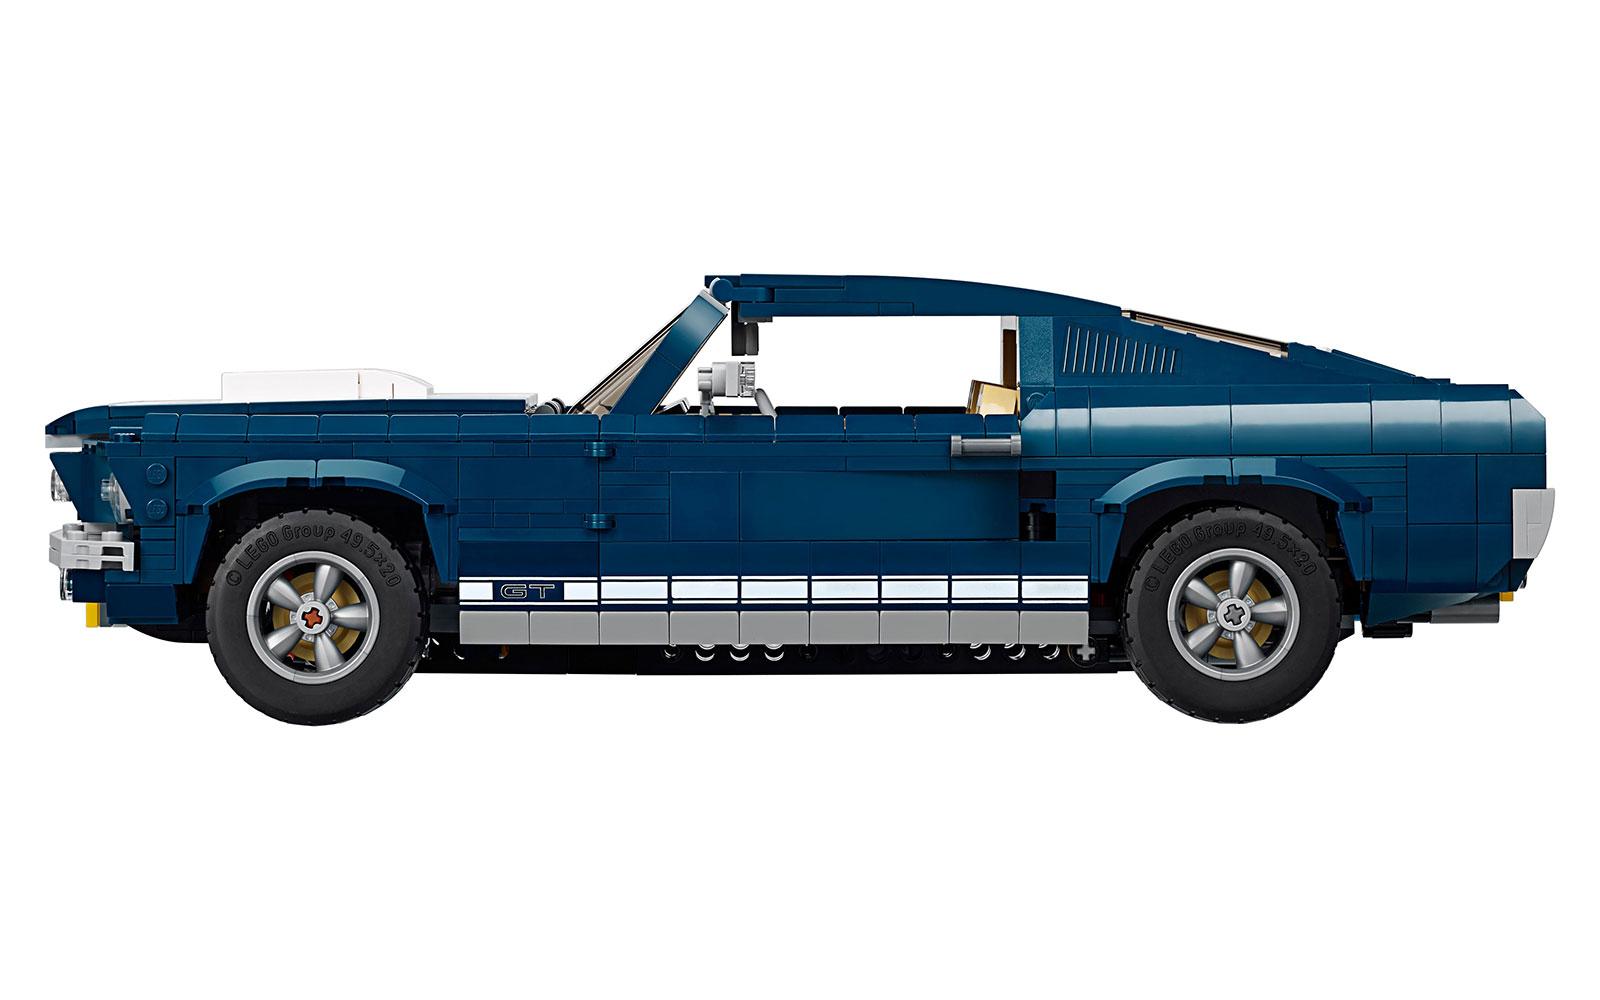 LEGO Creator Ford Mustang Replica